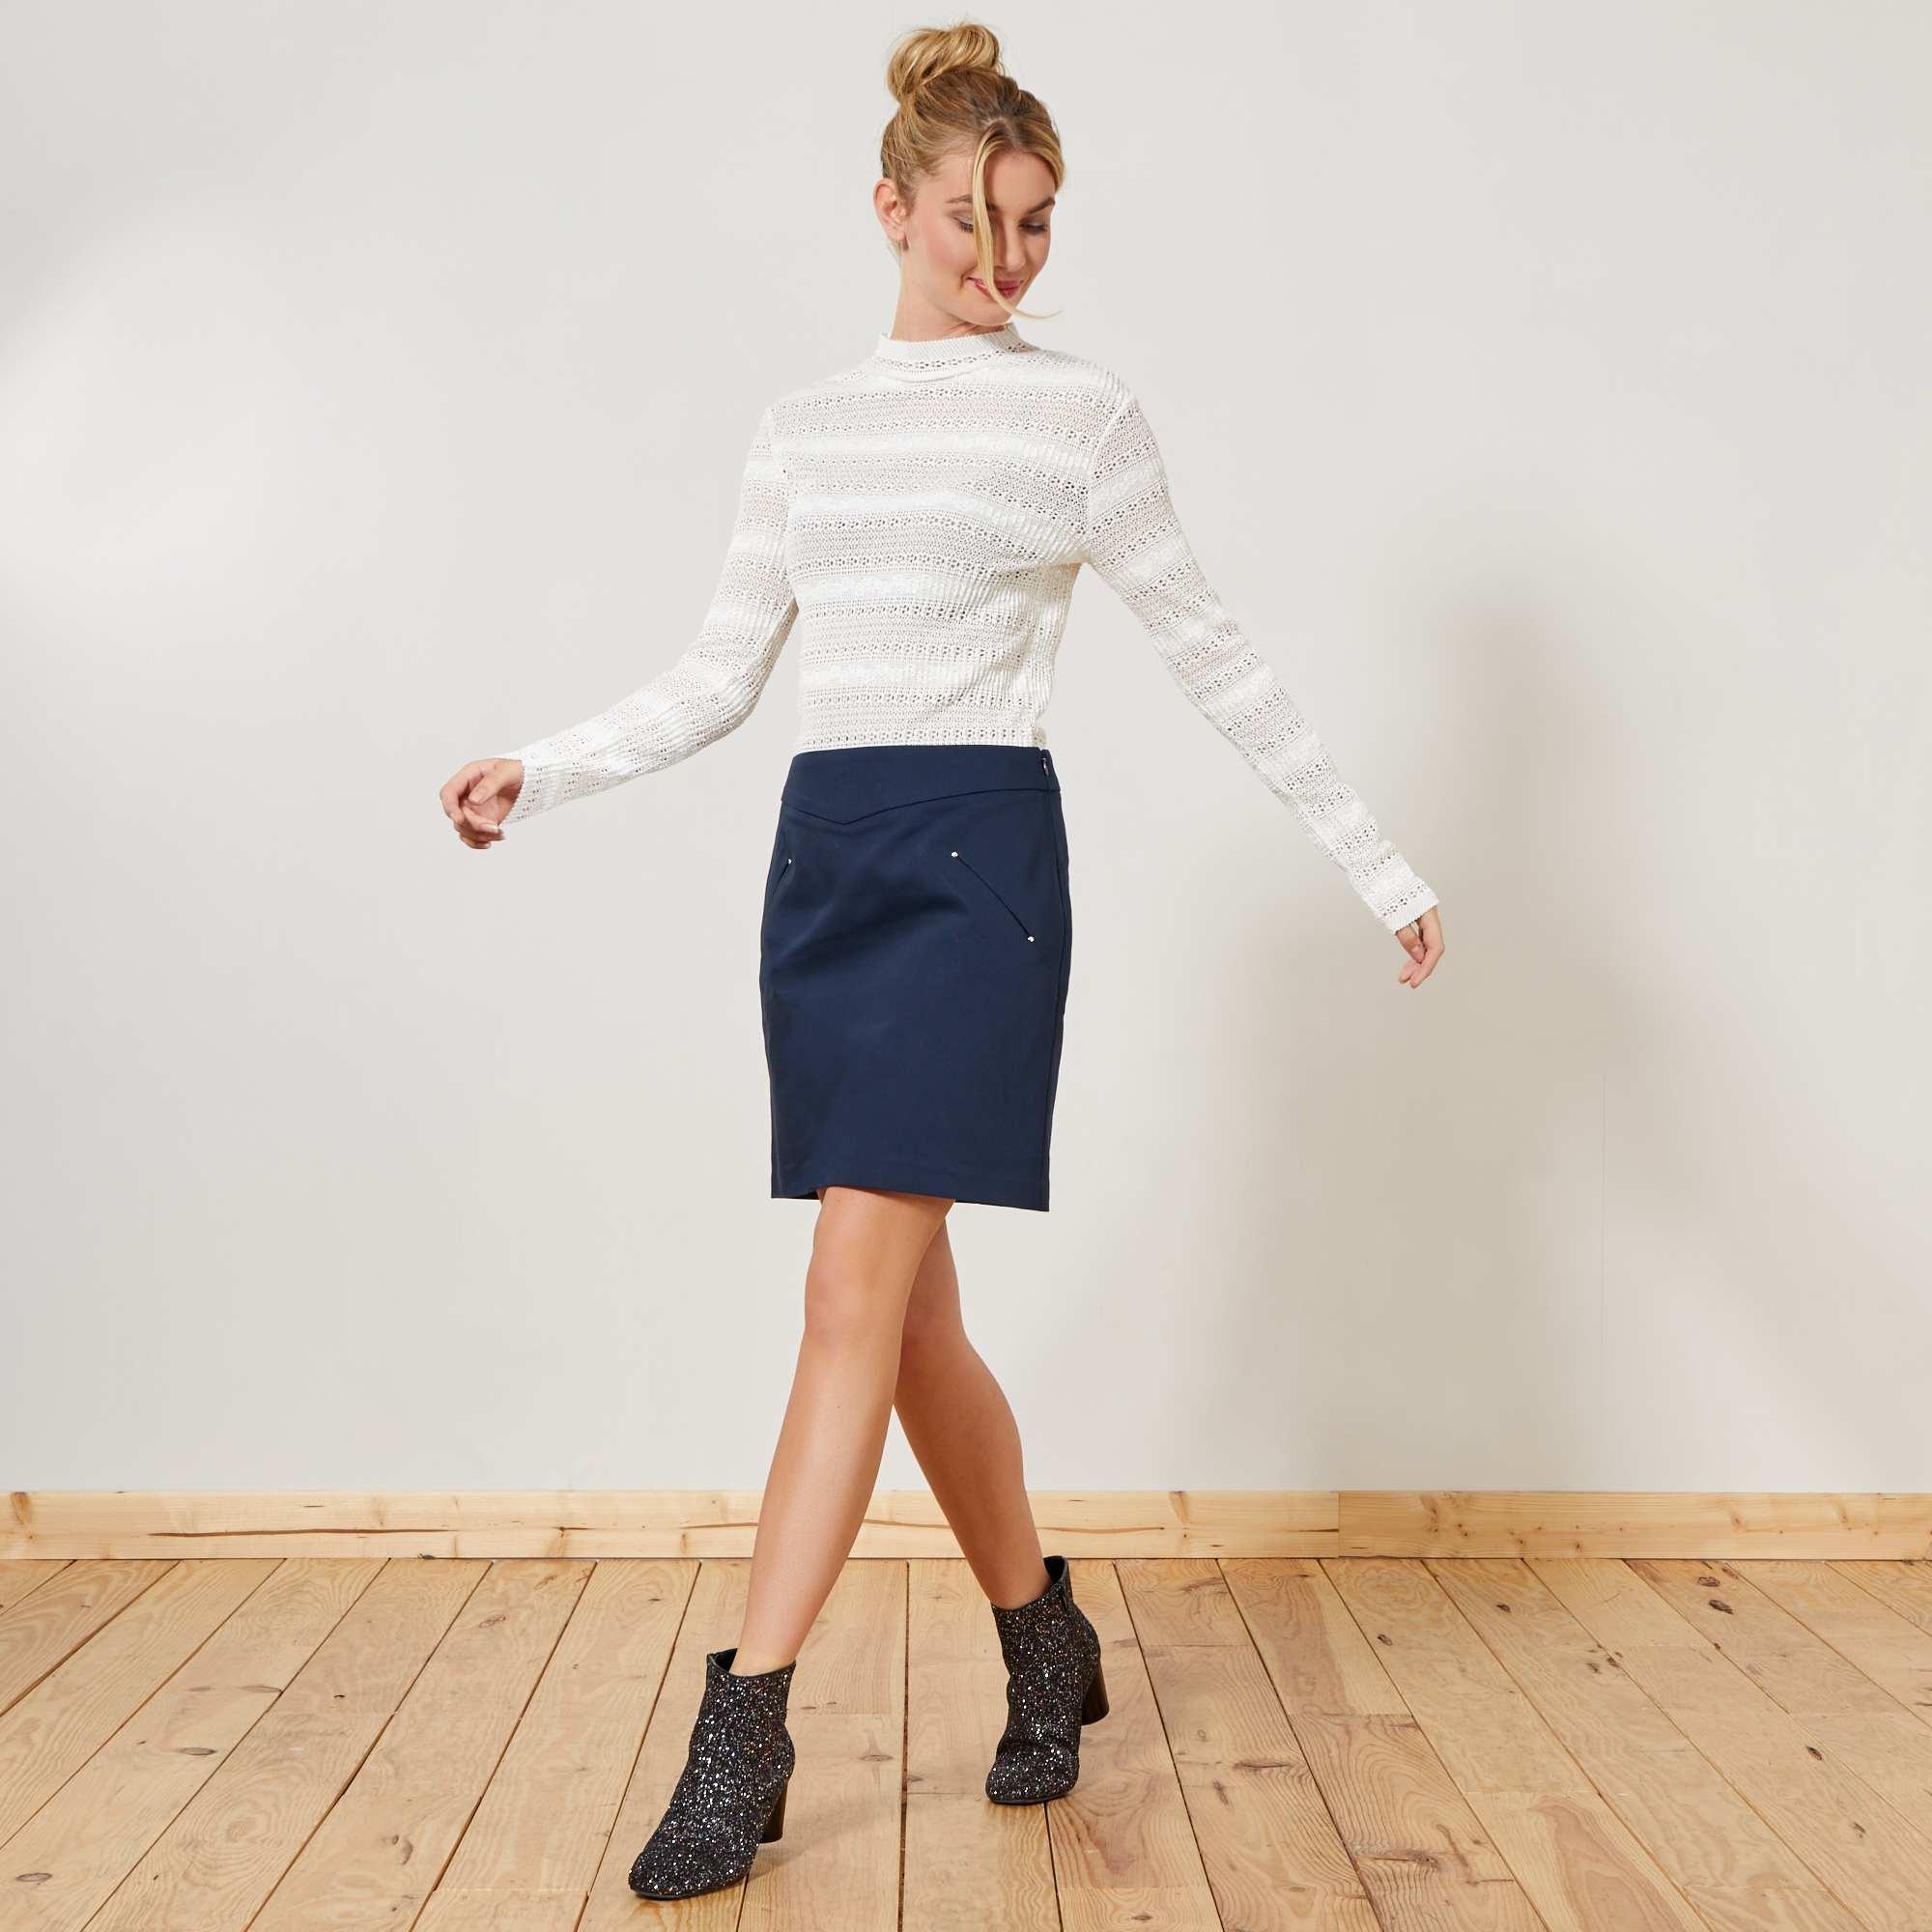 adbf52f067e53 Jupe courte esprit tailleur Femme - bleu marine - Kiabi - 12,00€